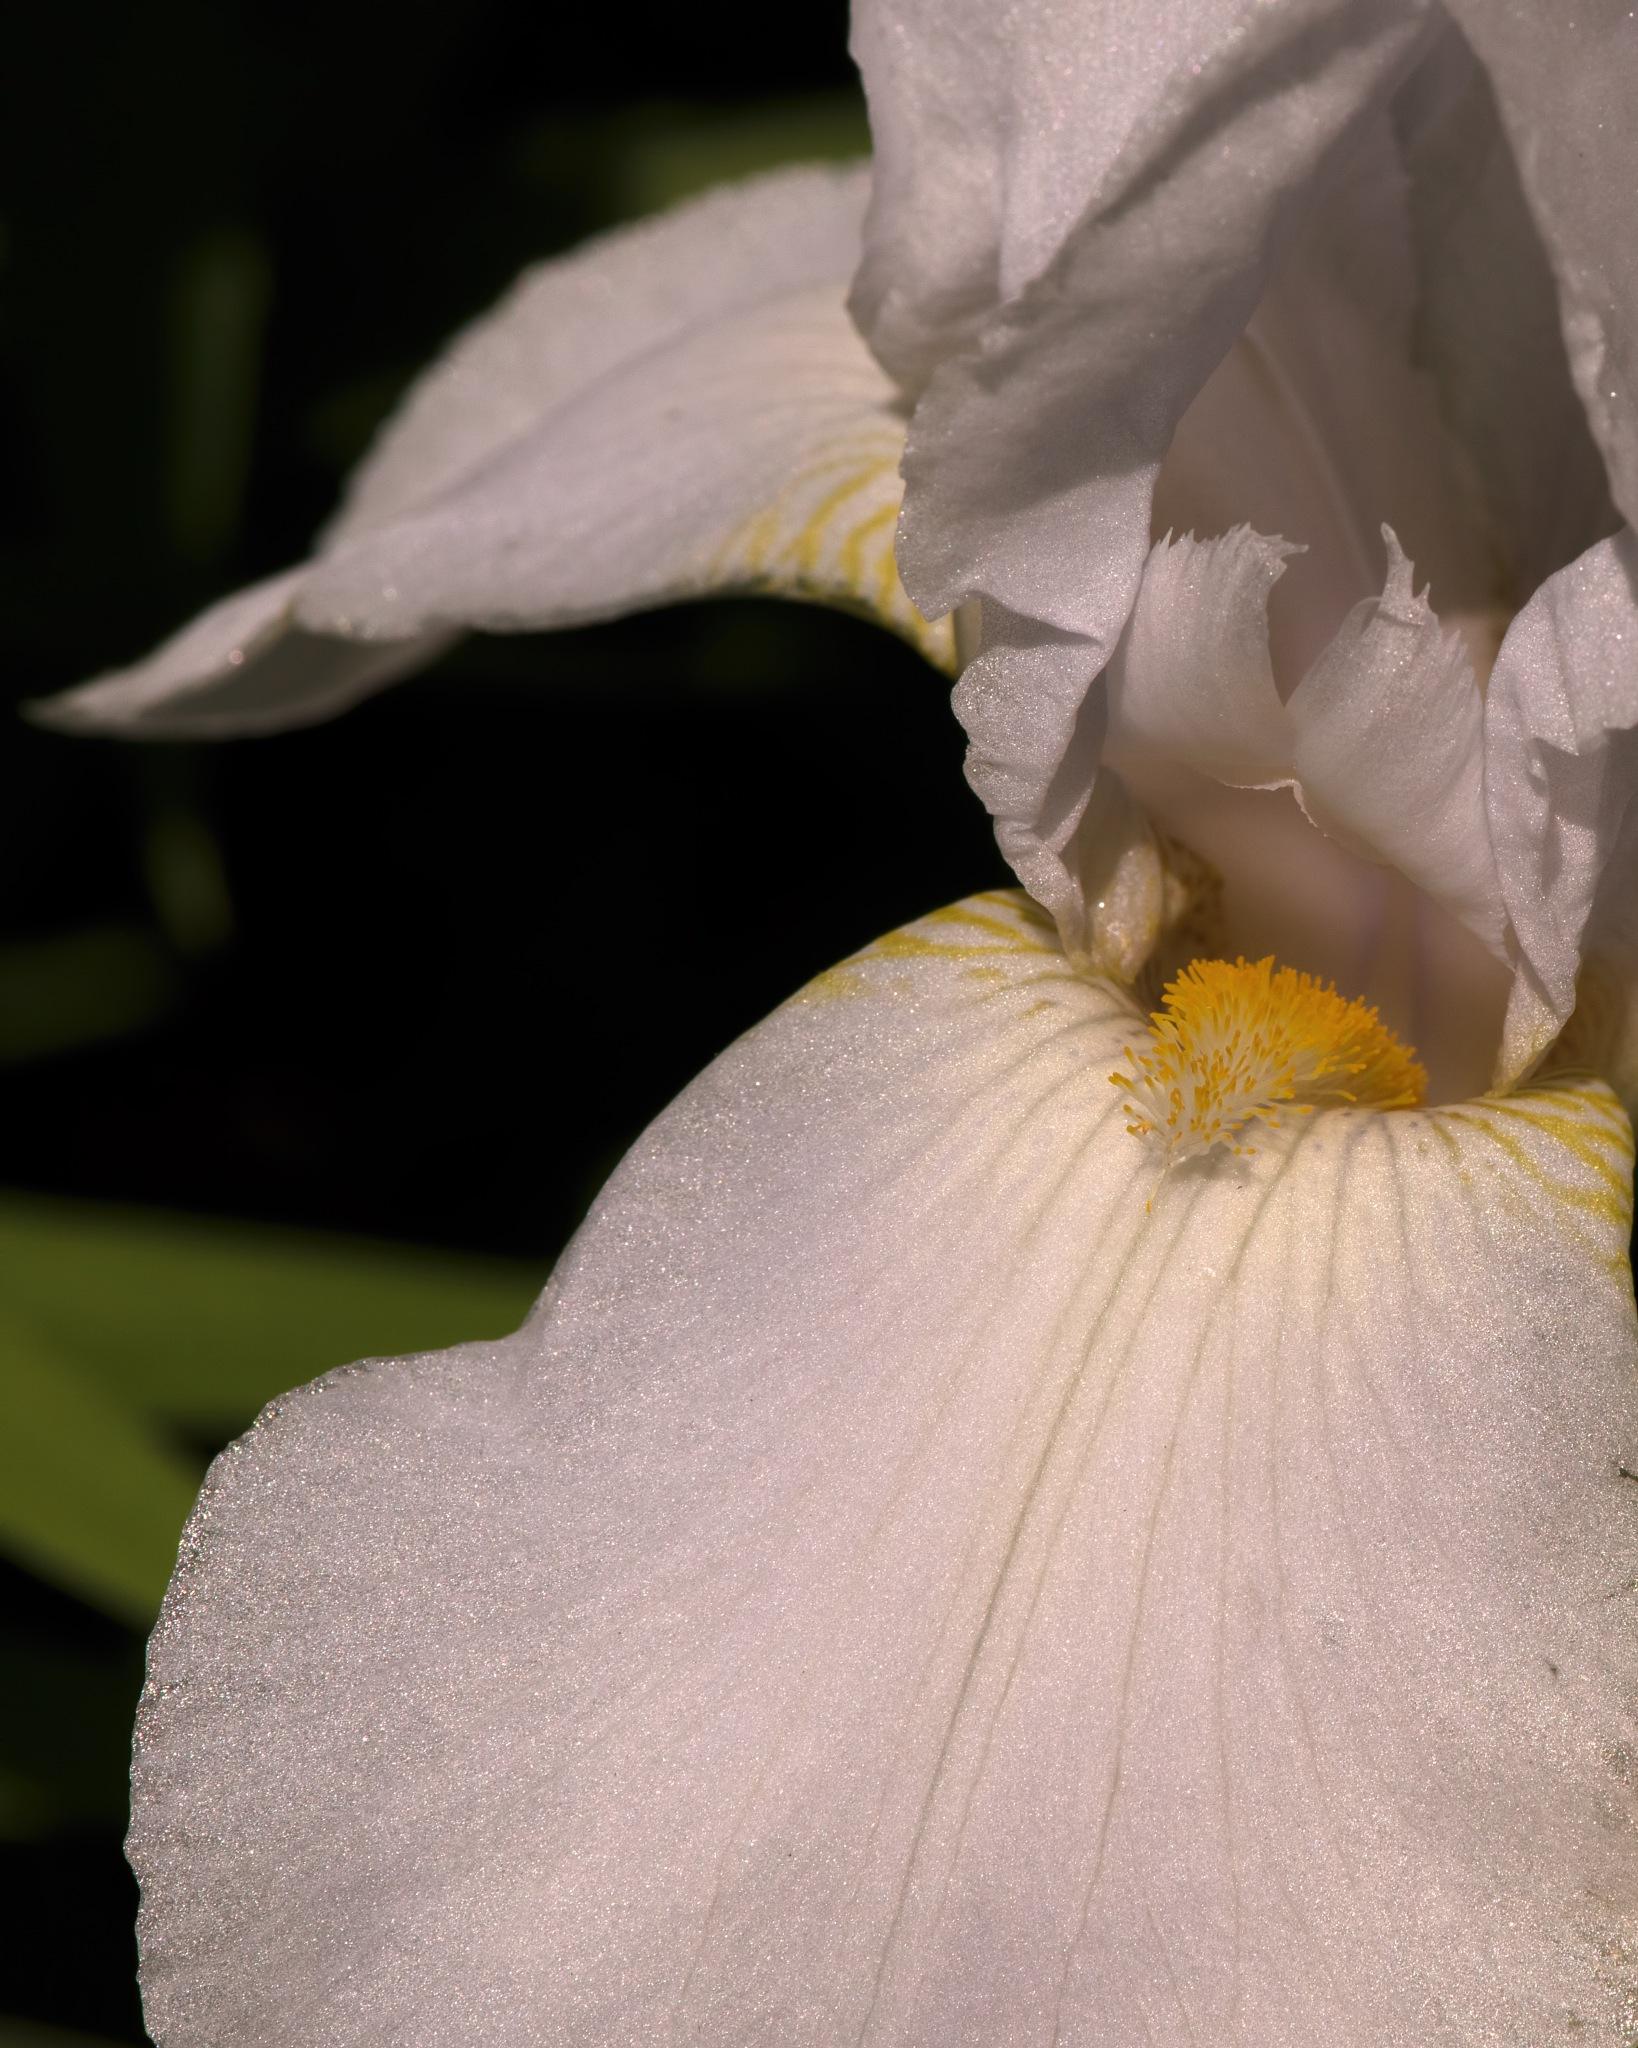 White Iris 0704 by ThomasJerger